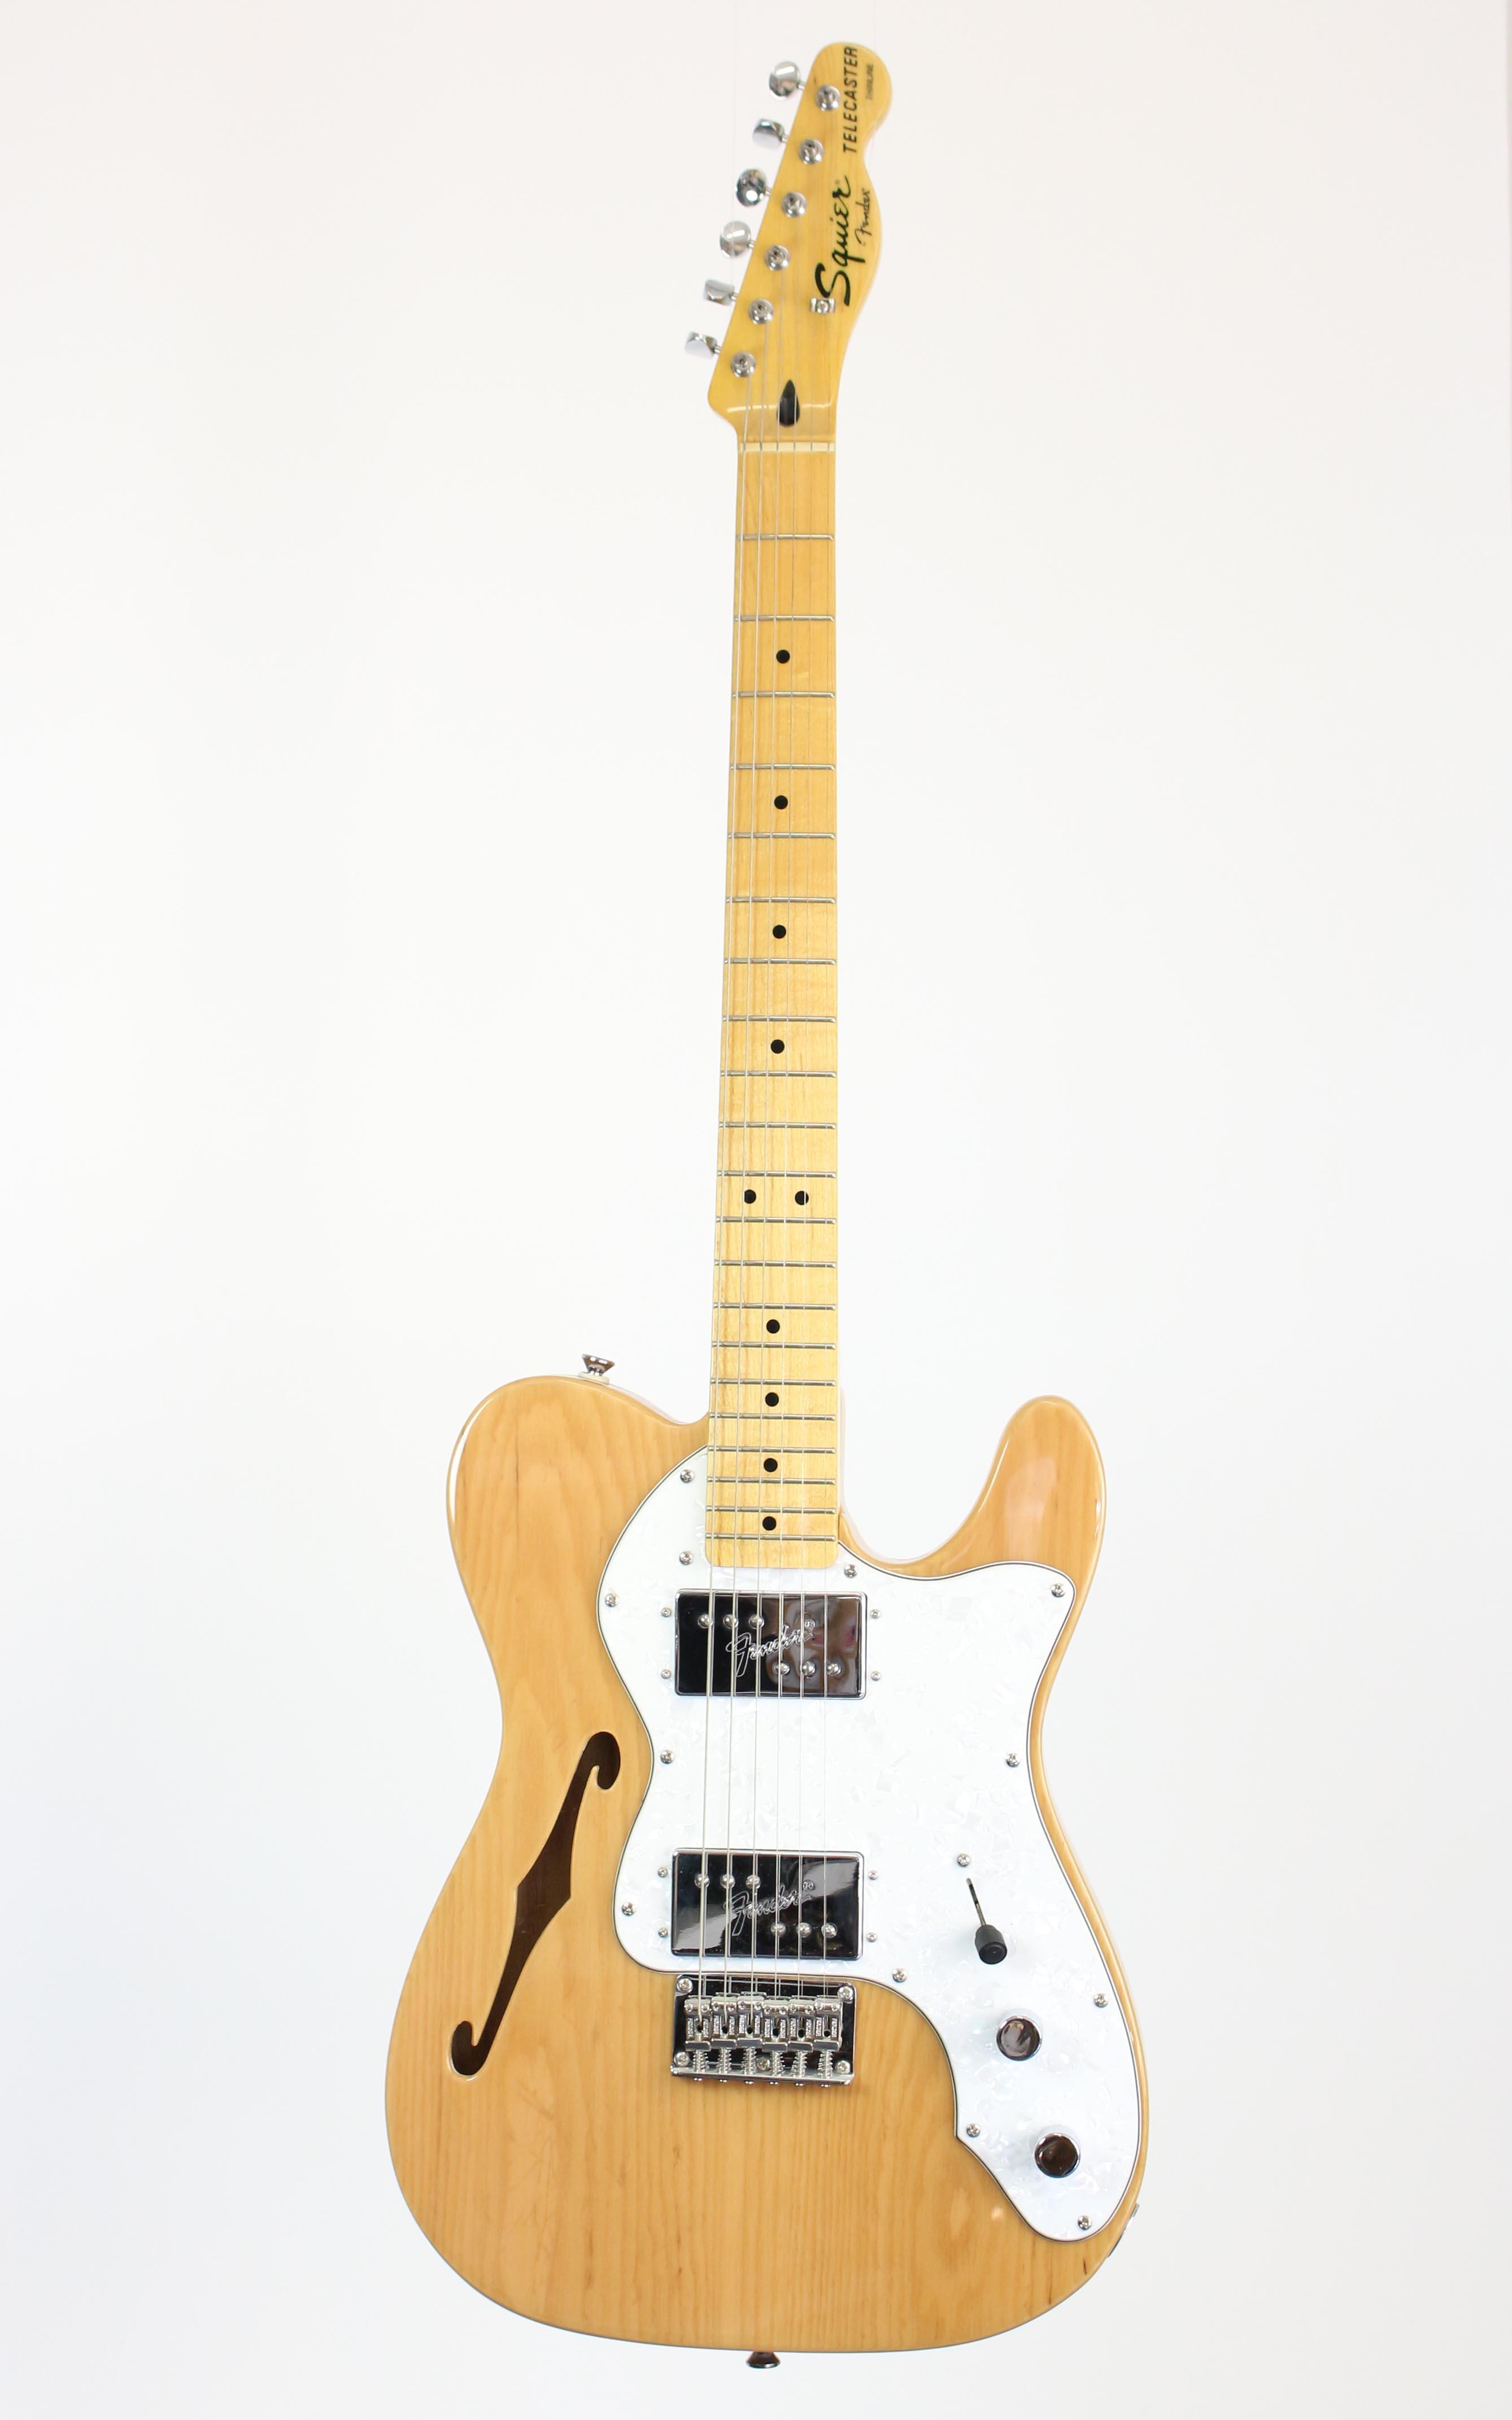 Fender Squier - CV 70s Tele Thinline MN NAT - Gitarren - E-Gitarren | MUSIK BERTRAM Deutschland Freiburg